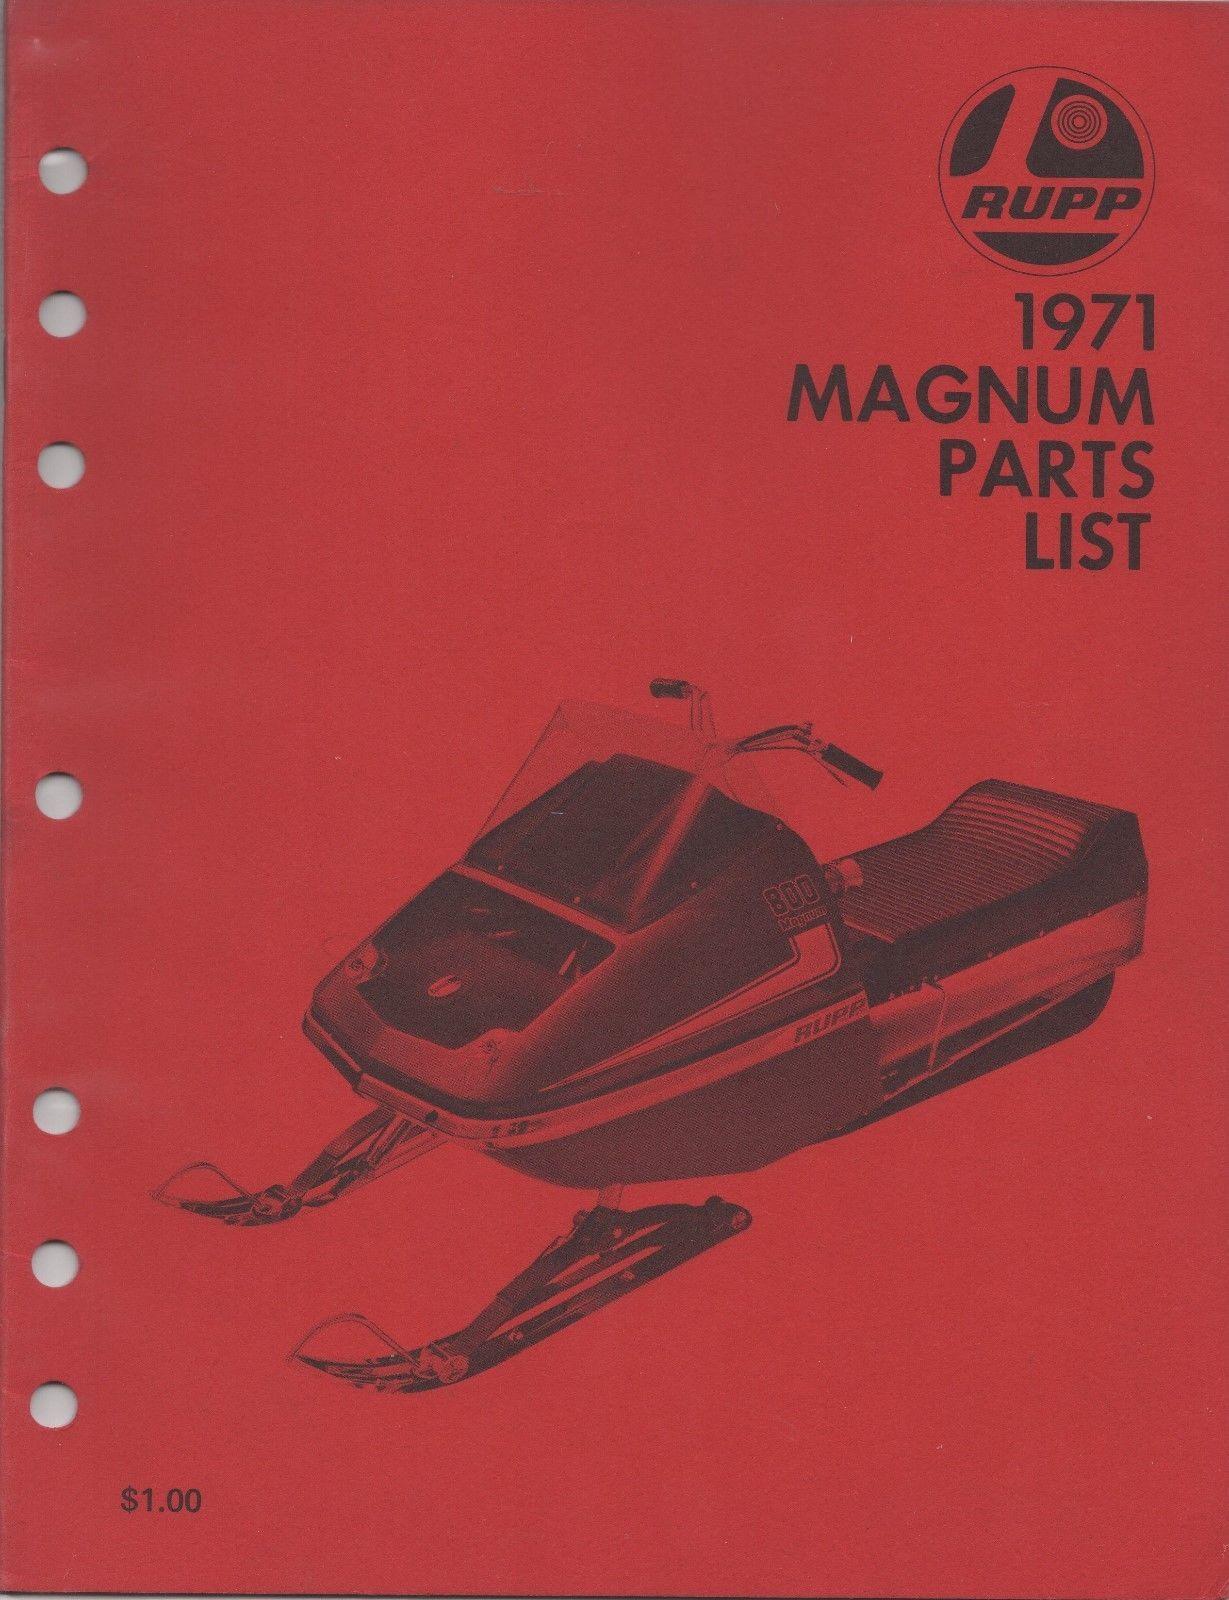 Manuals 26351: 1971 Rare Original Rupp Snowmobile Magnum Parts Manual (623)  ->